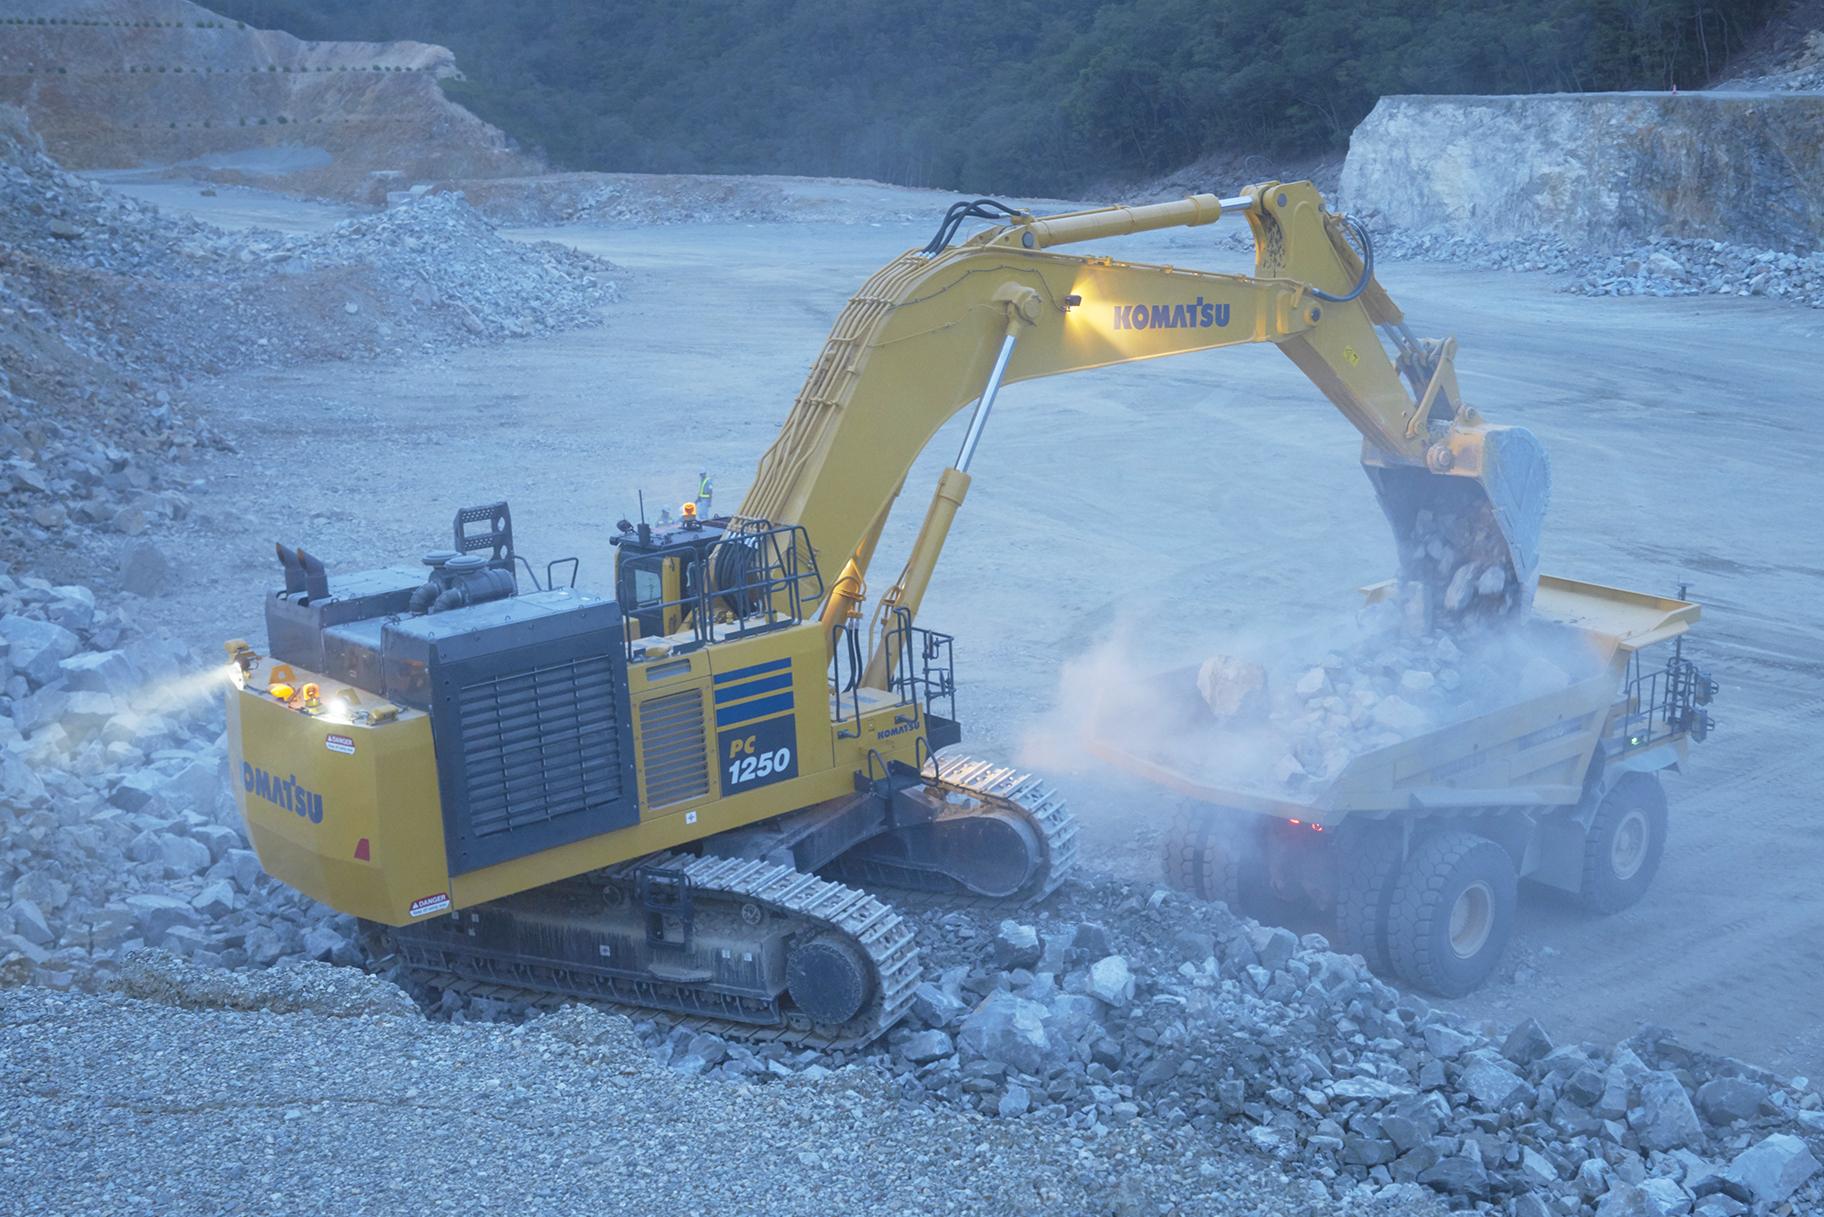 Diesel Exhaust Fluid >> Komatsu America introduces new PC1250SP-11 Tier 4 Final excavators - International Mining